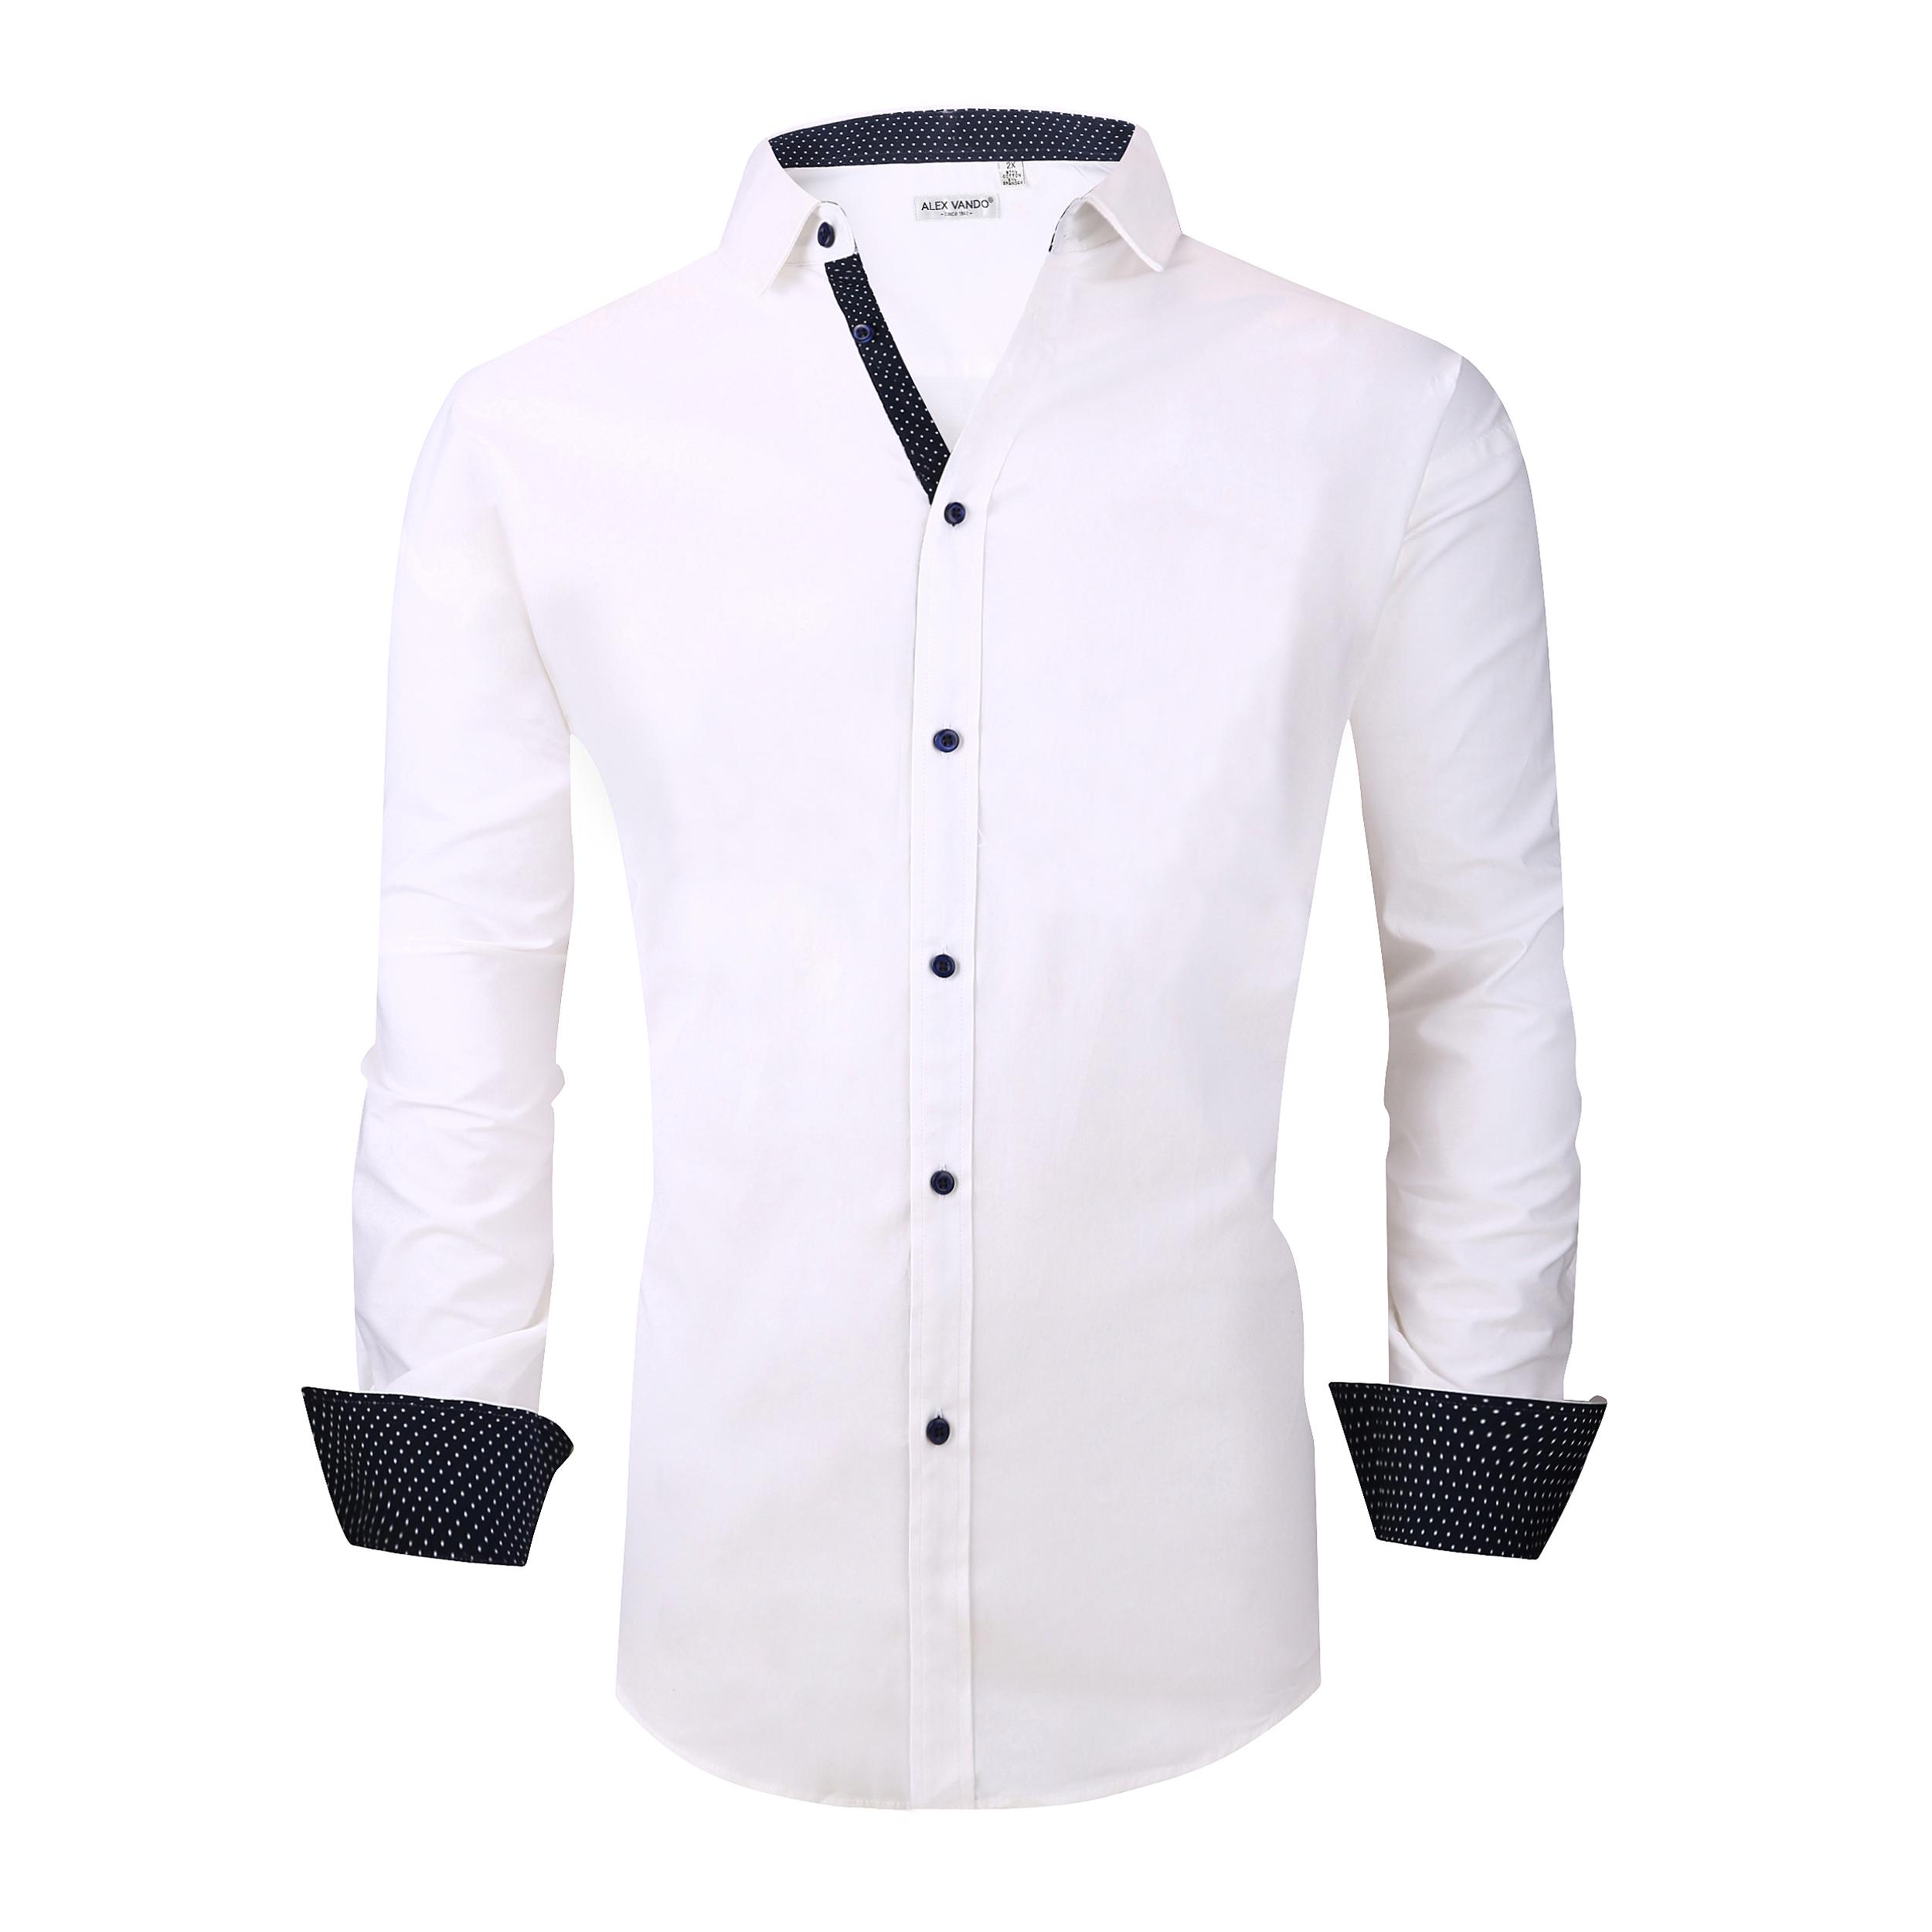 d21c91f8a40 Alex Vando Mens Big & Tall Dress Shirts Regular Fit Long Sleeve Men Shirt  White